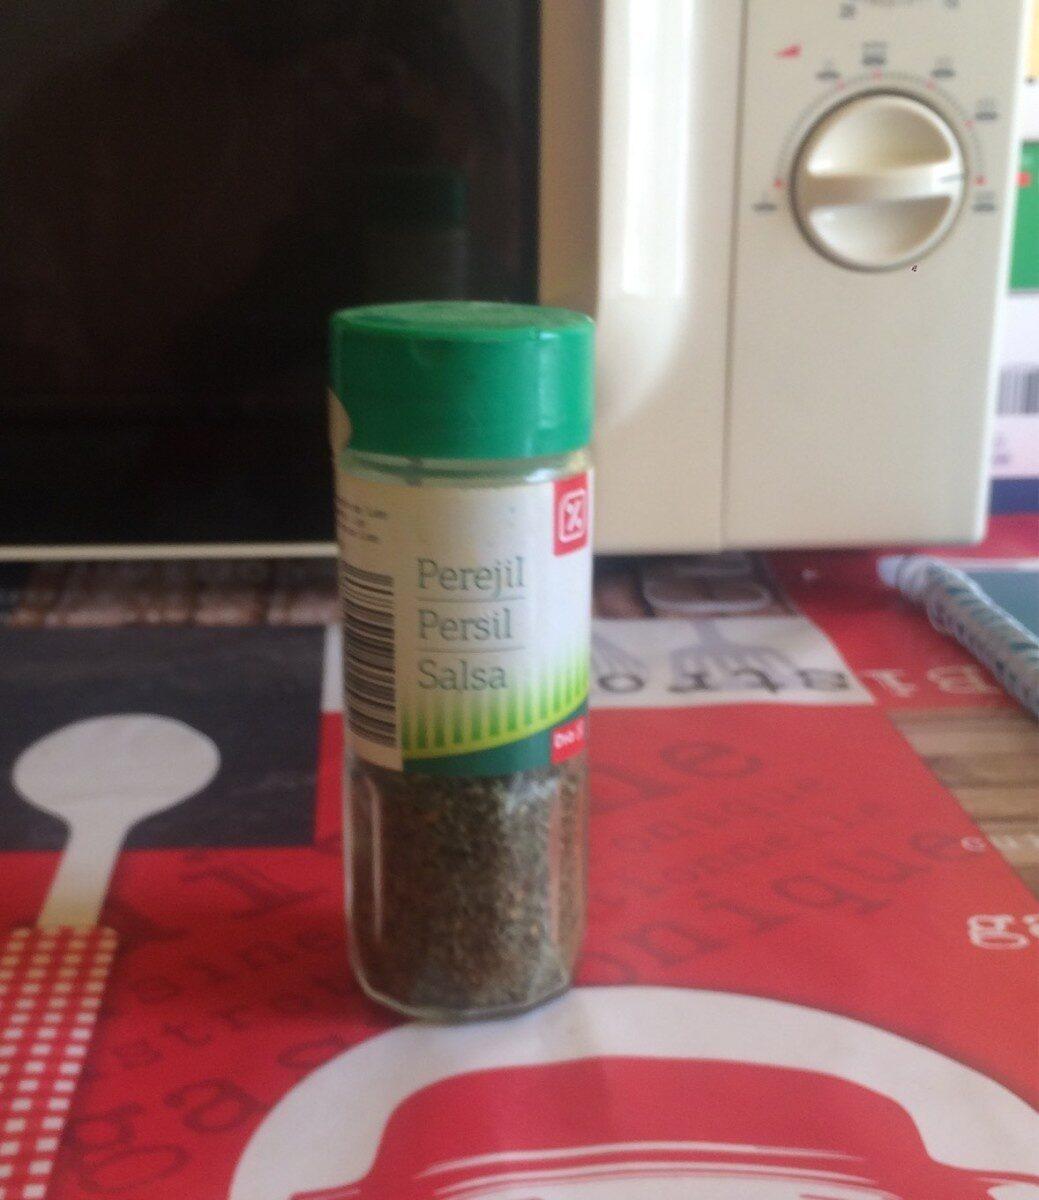 Salsa - Product